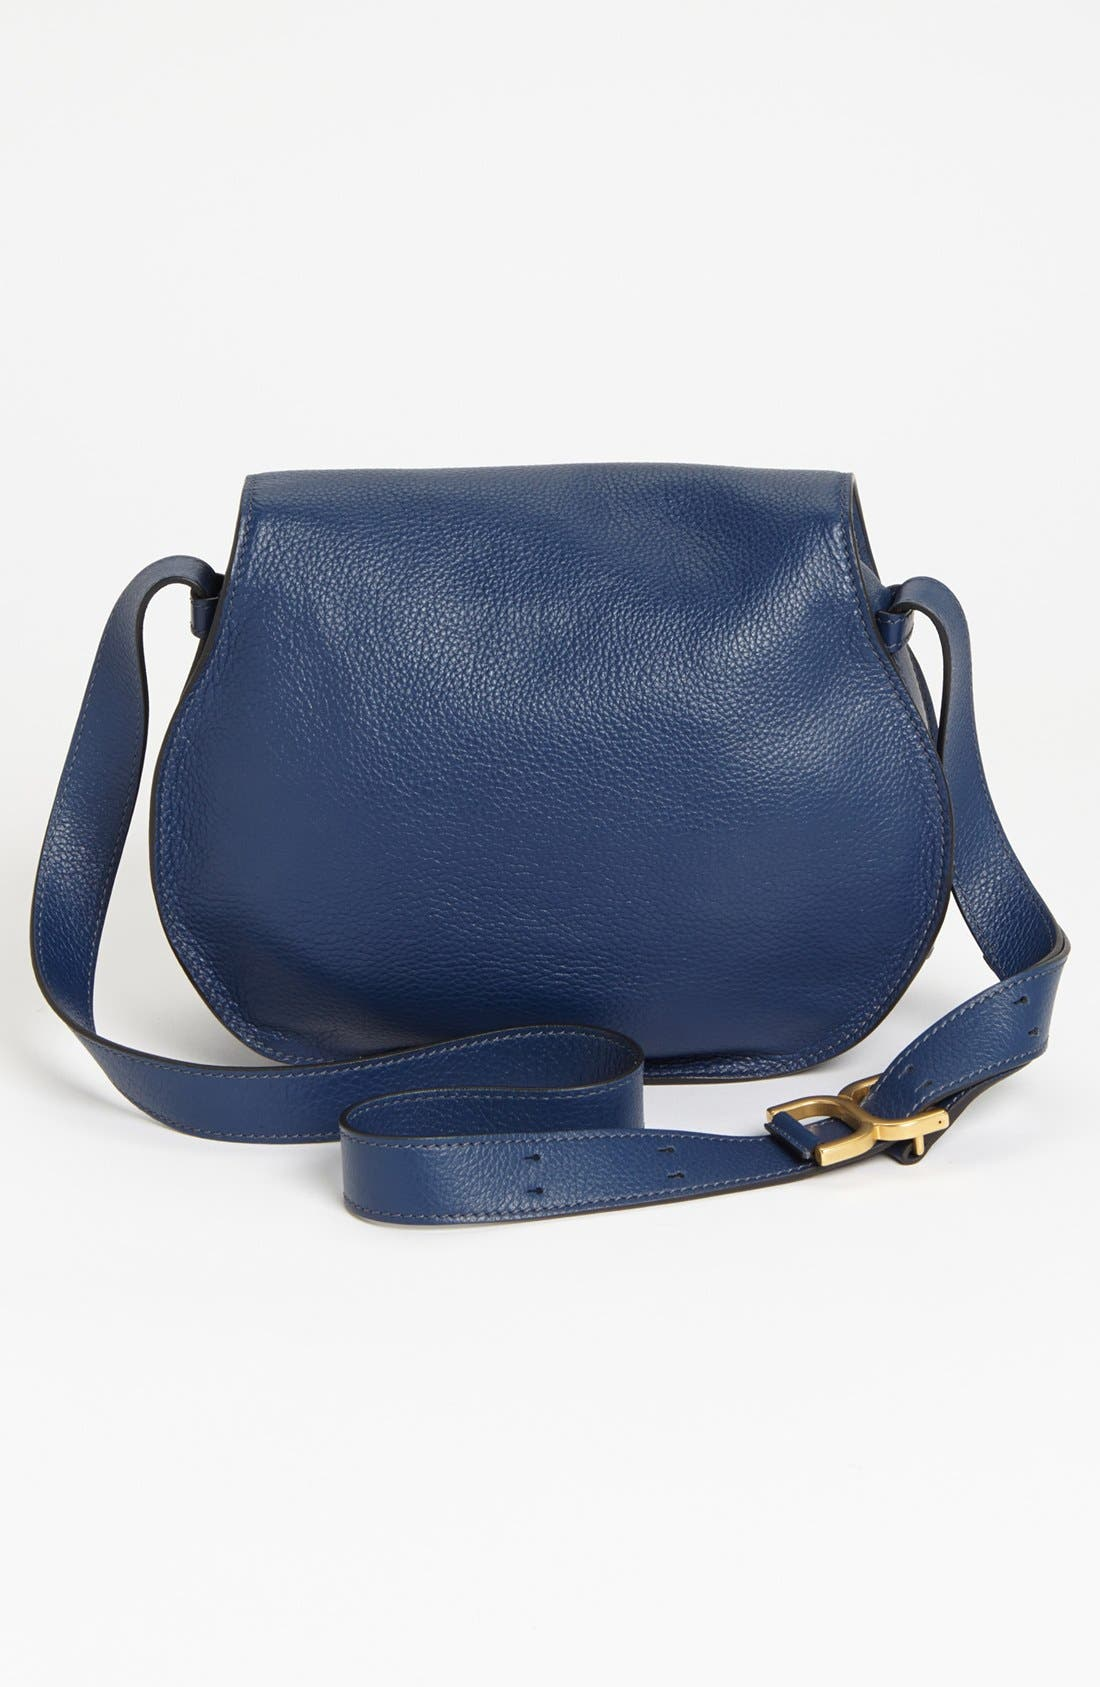 'Marcie - Medium' Leather Crossbody Bag,                             Alternate thumbnail 3, color,                             Royal Navy